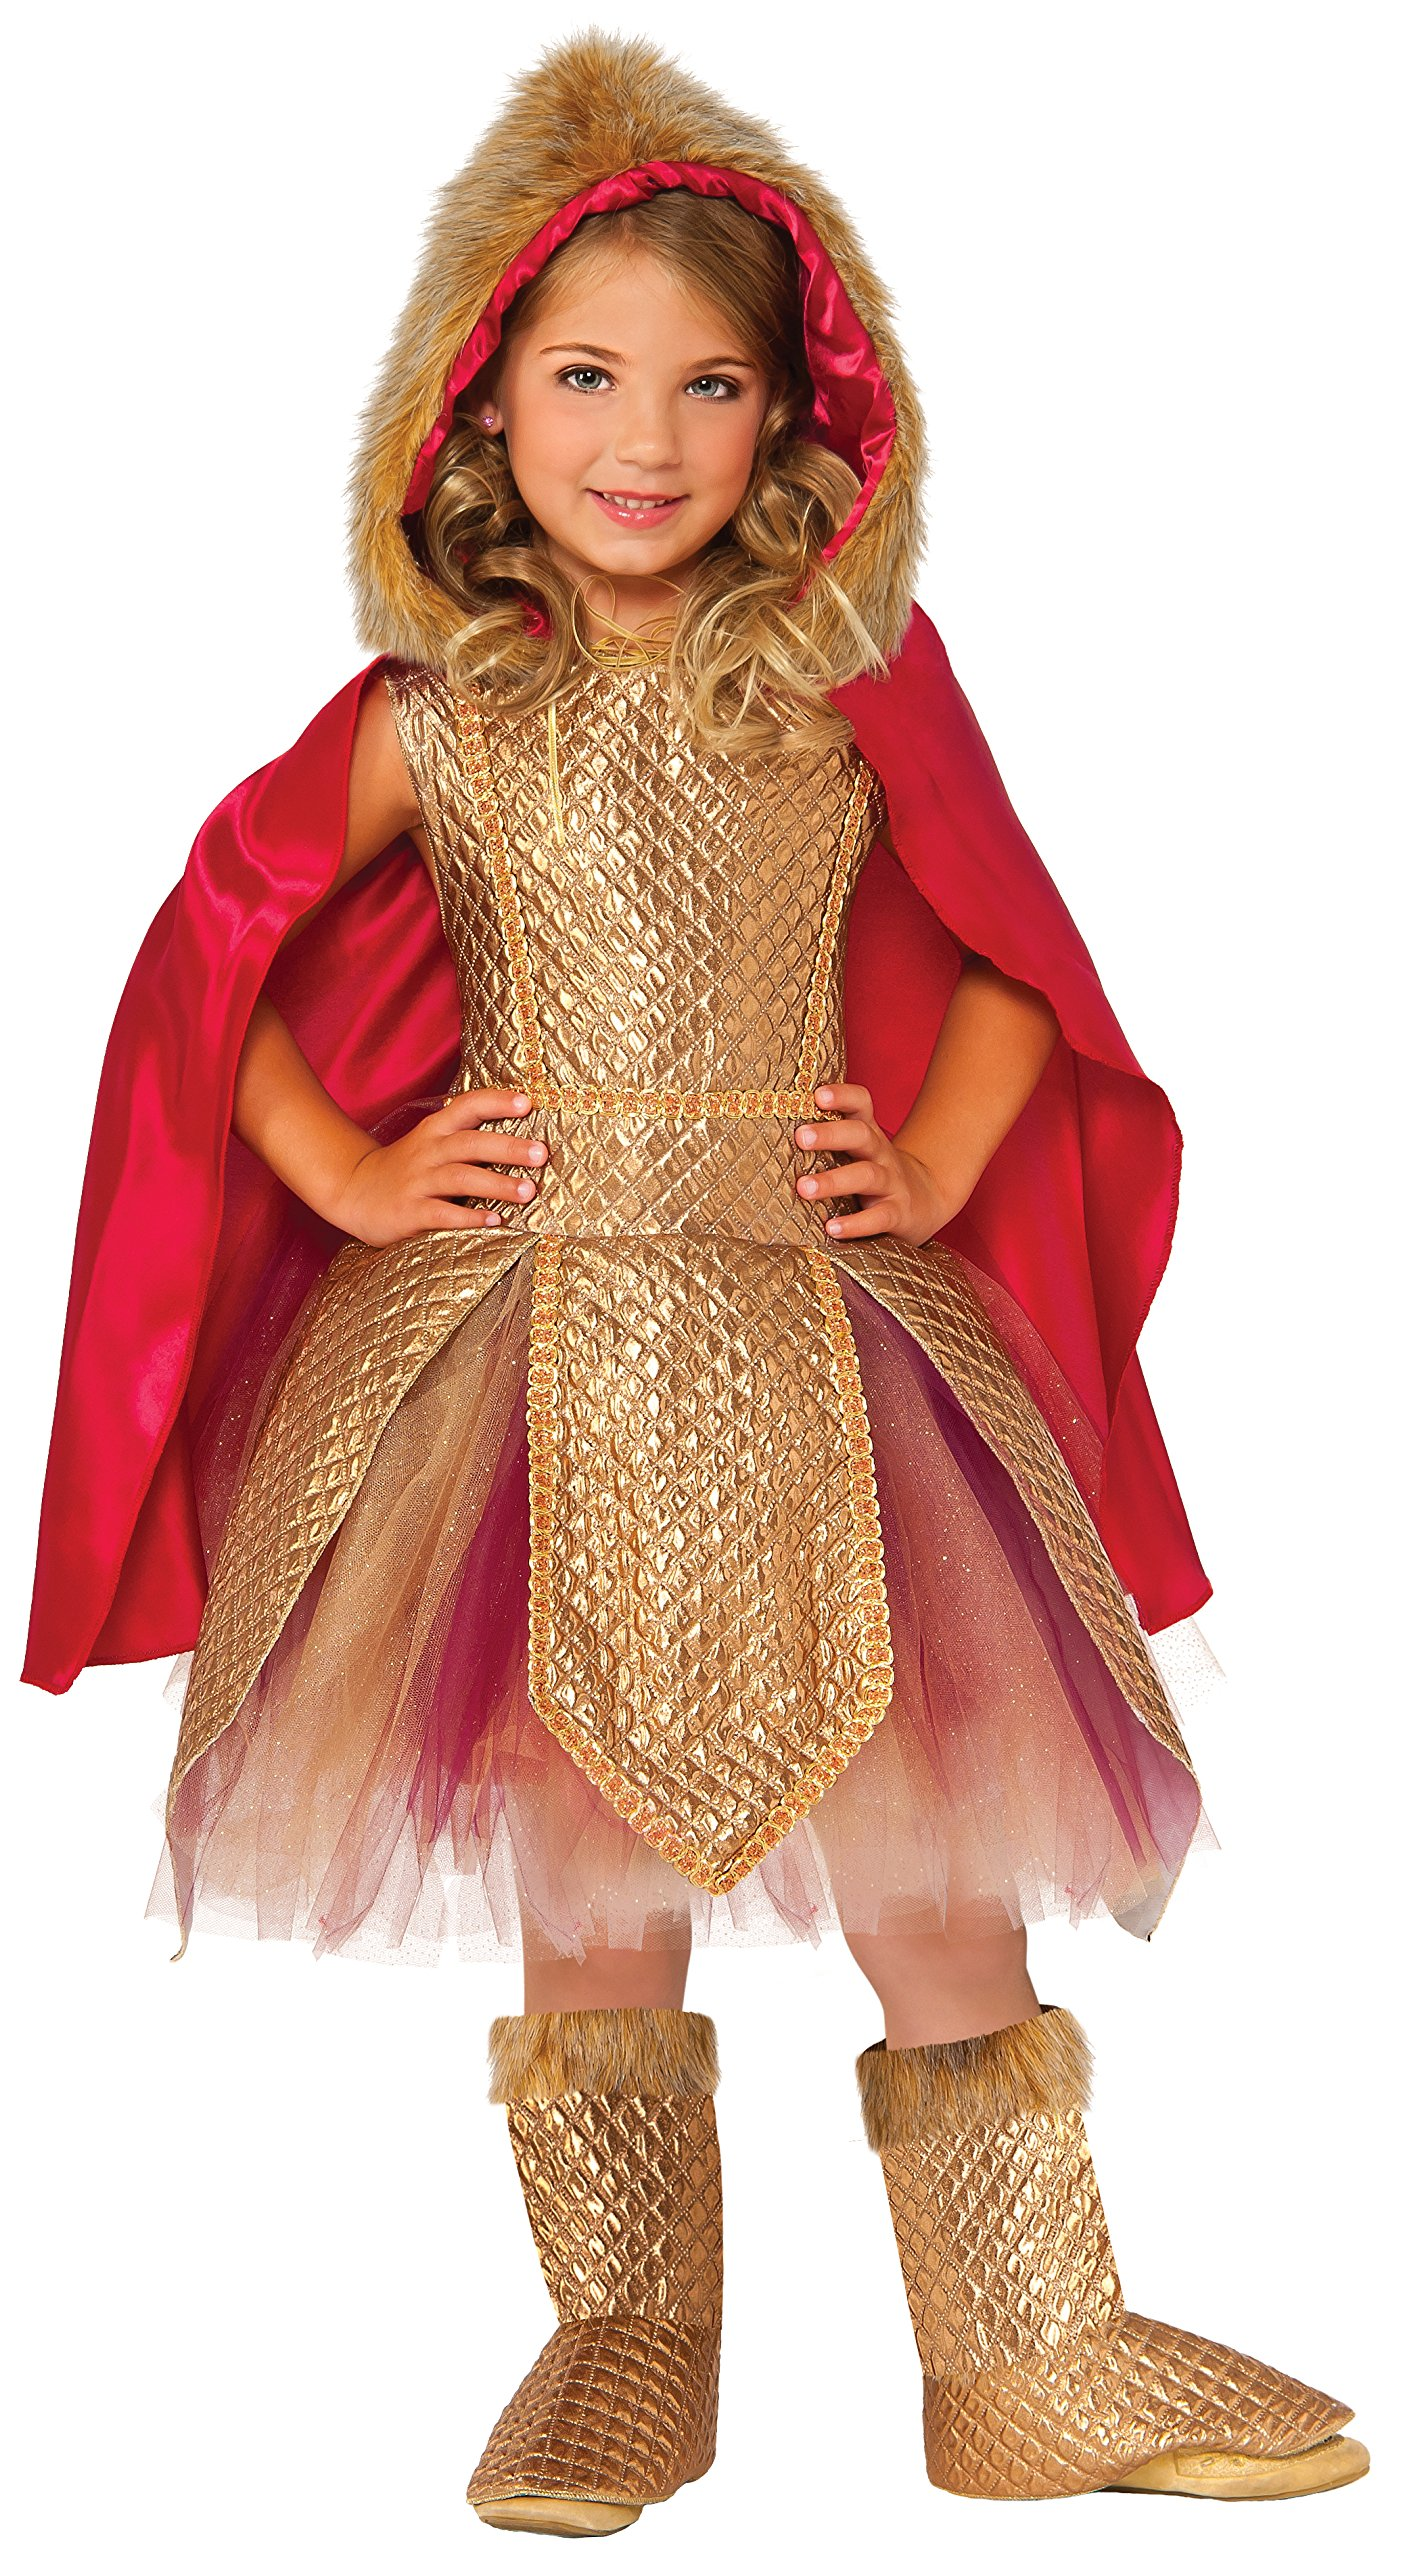 Rubie's Costume Kids Deluxe Warrior Princess Costume, Small